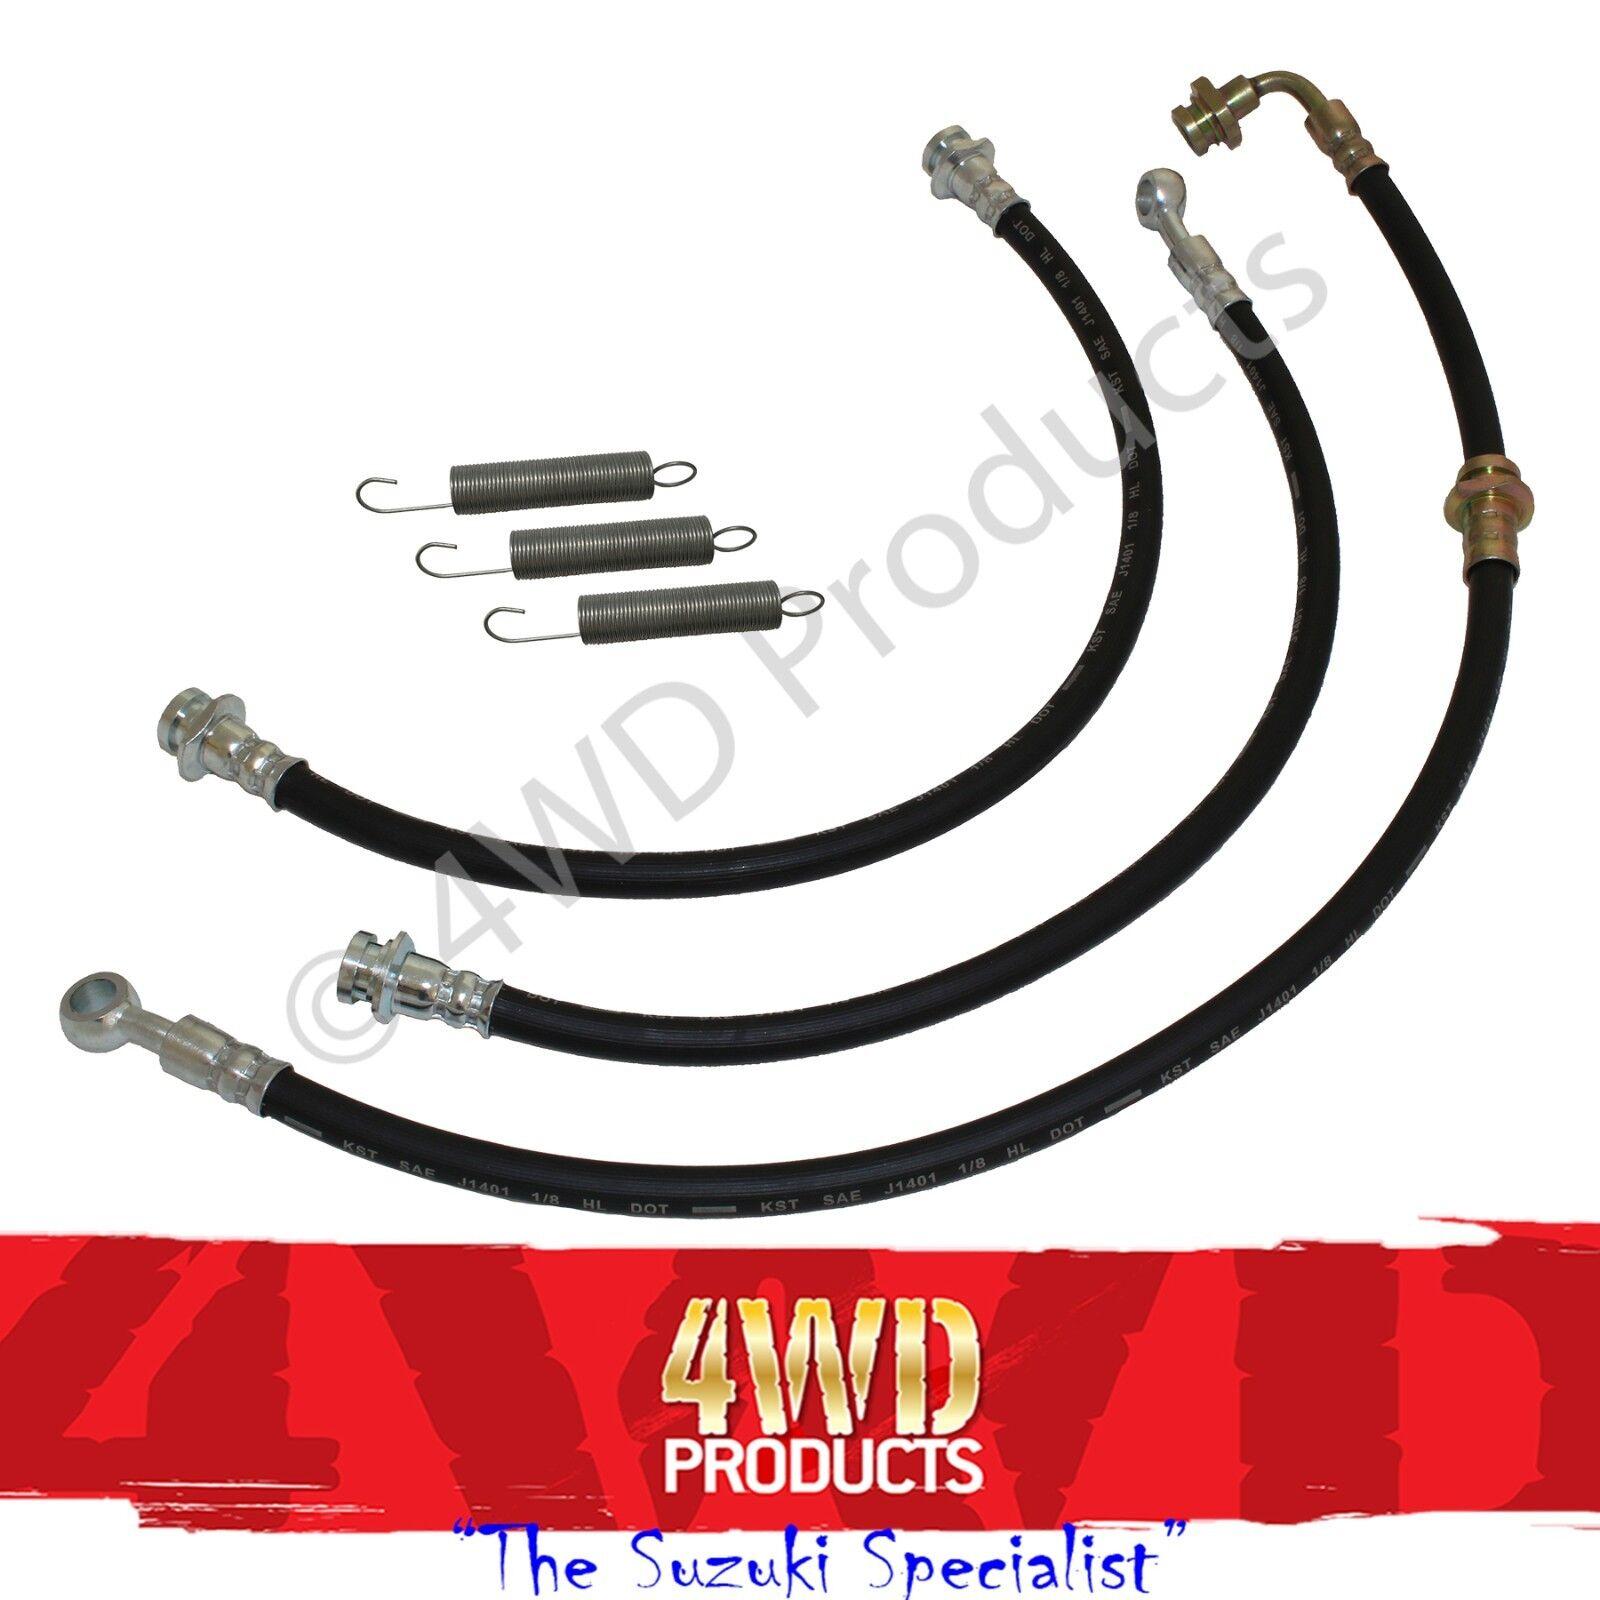 Rubber Brake Line Hose : Mm quot extended rubber brake line hose kit suzuki